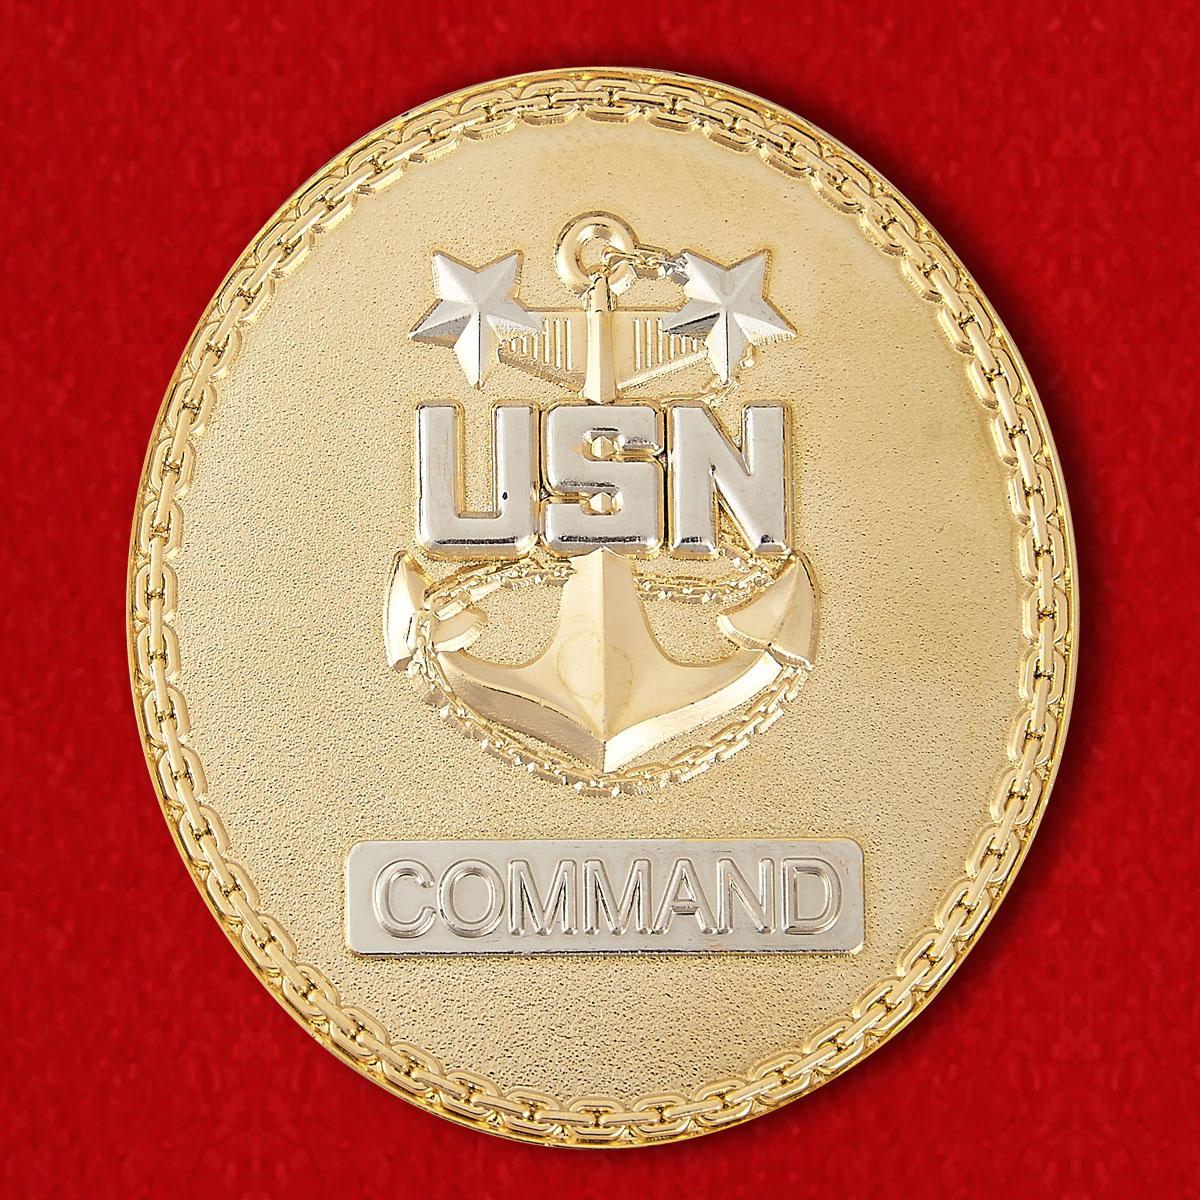 Presented For Excellence CMDCM (SWIAW) Gari Mendus USS Essex (LHD-2) Challenge Сoin